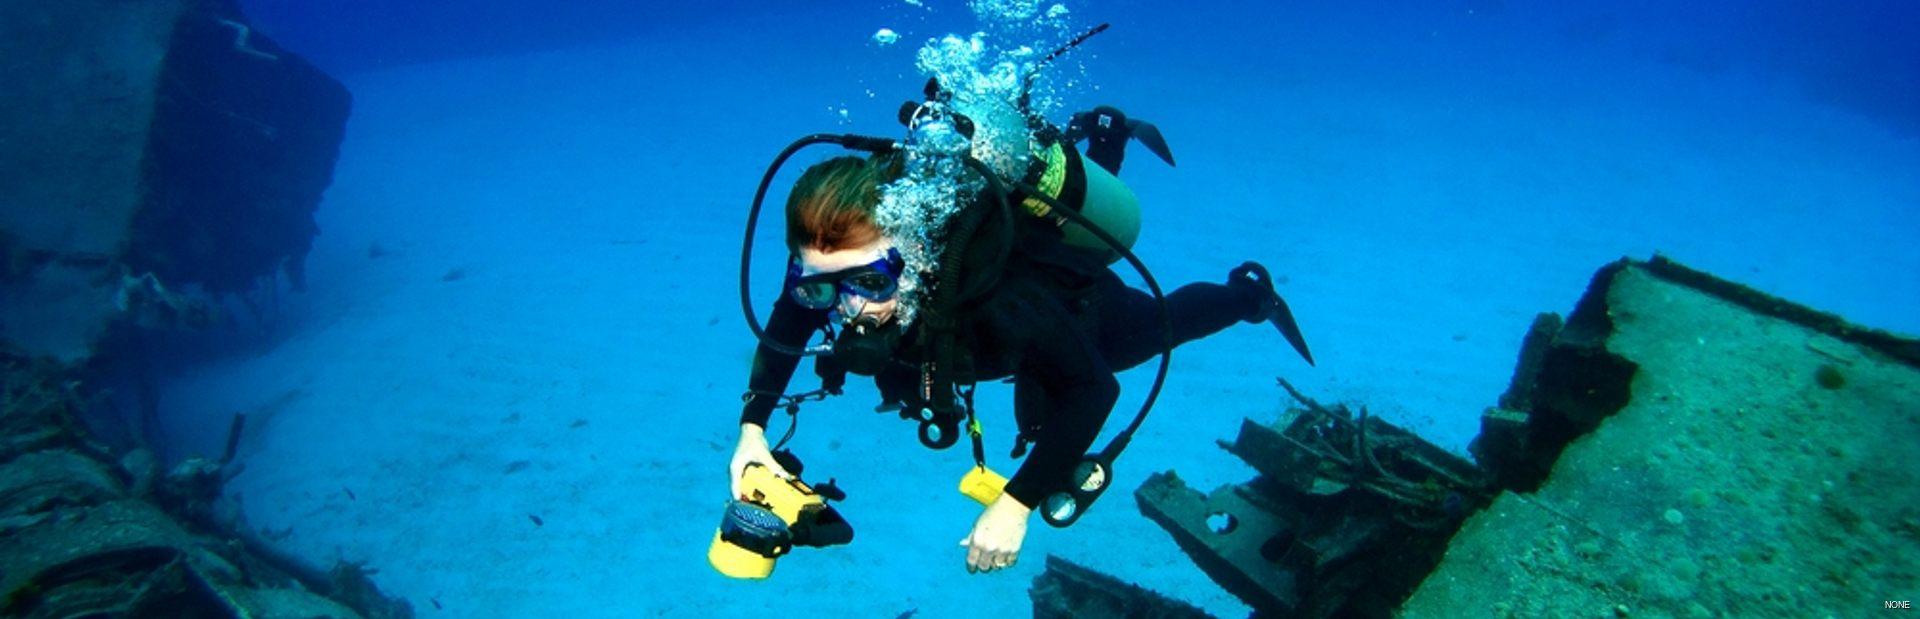 Cayman Islands guide